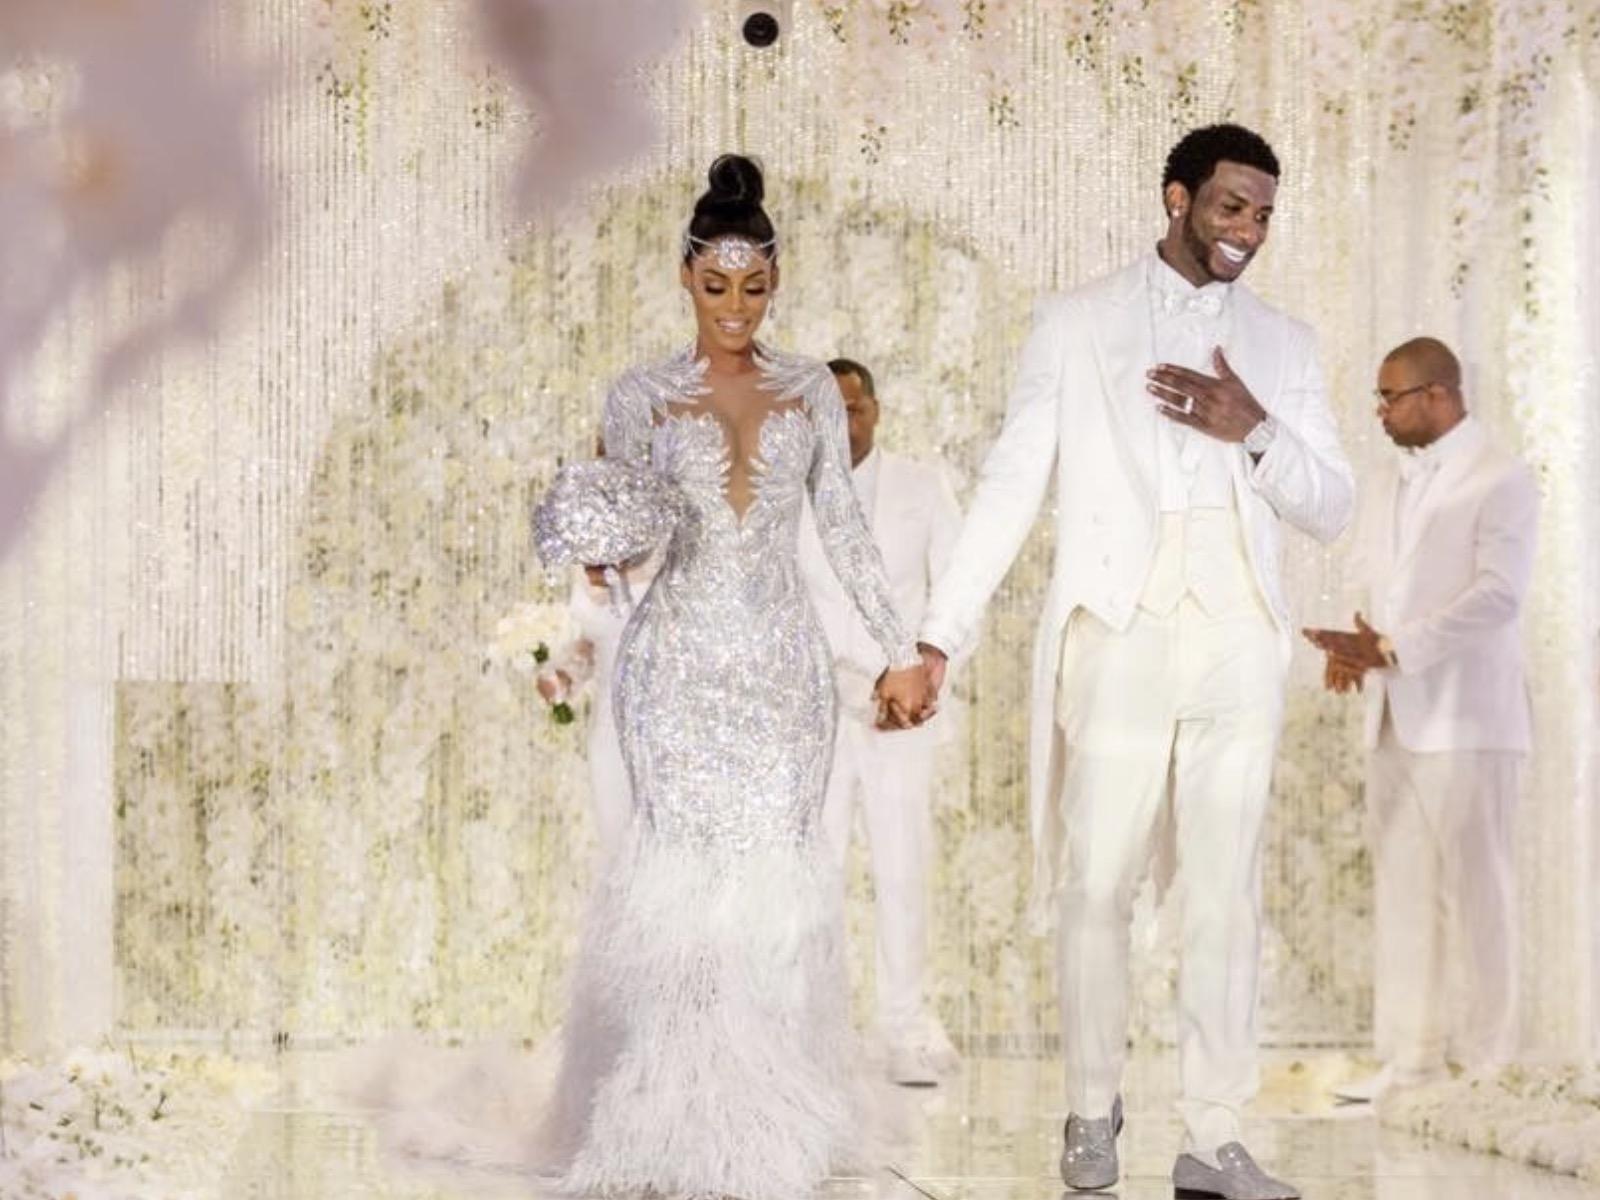 Gucci Mane Amp Keyshia Kaoir Bank Big Bucks For Televised